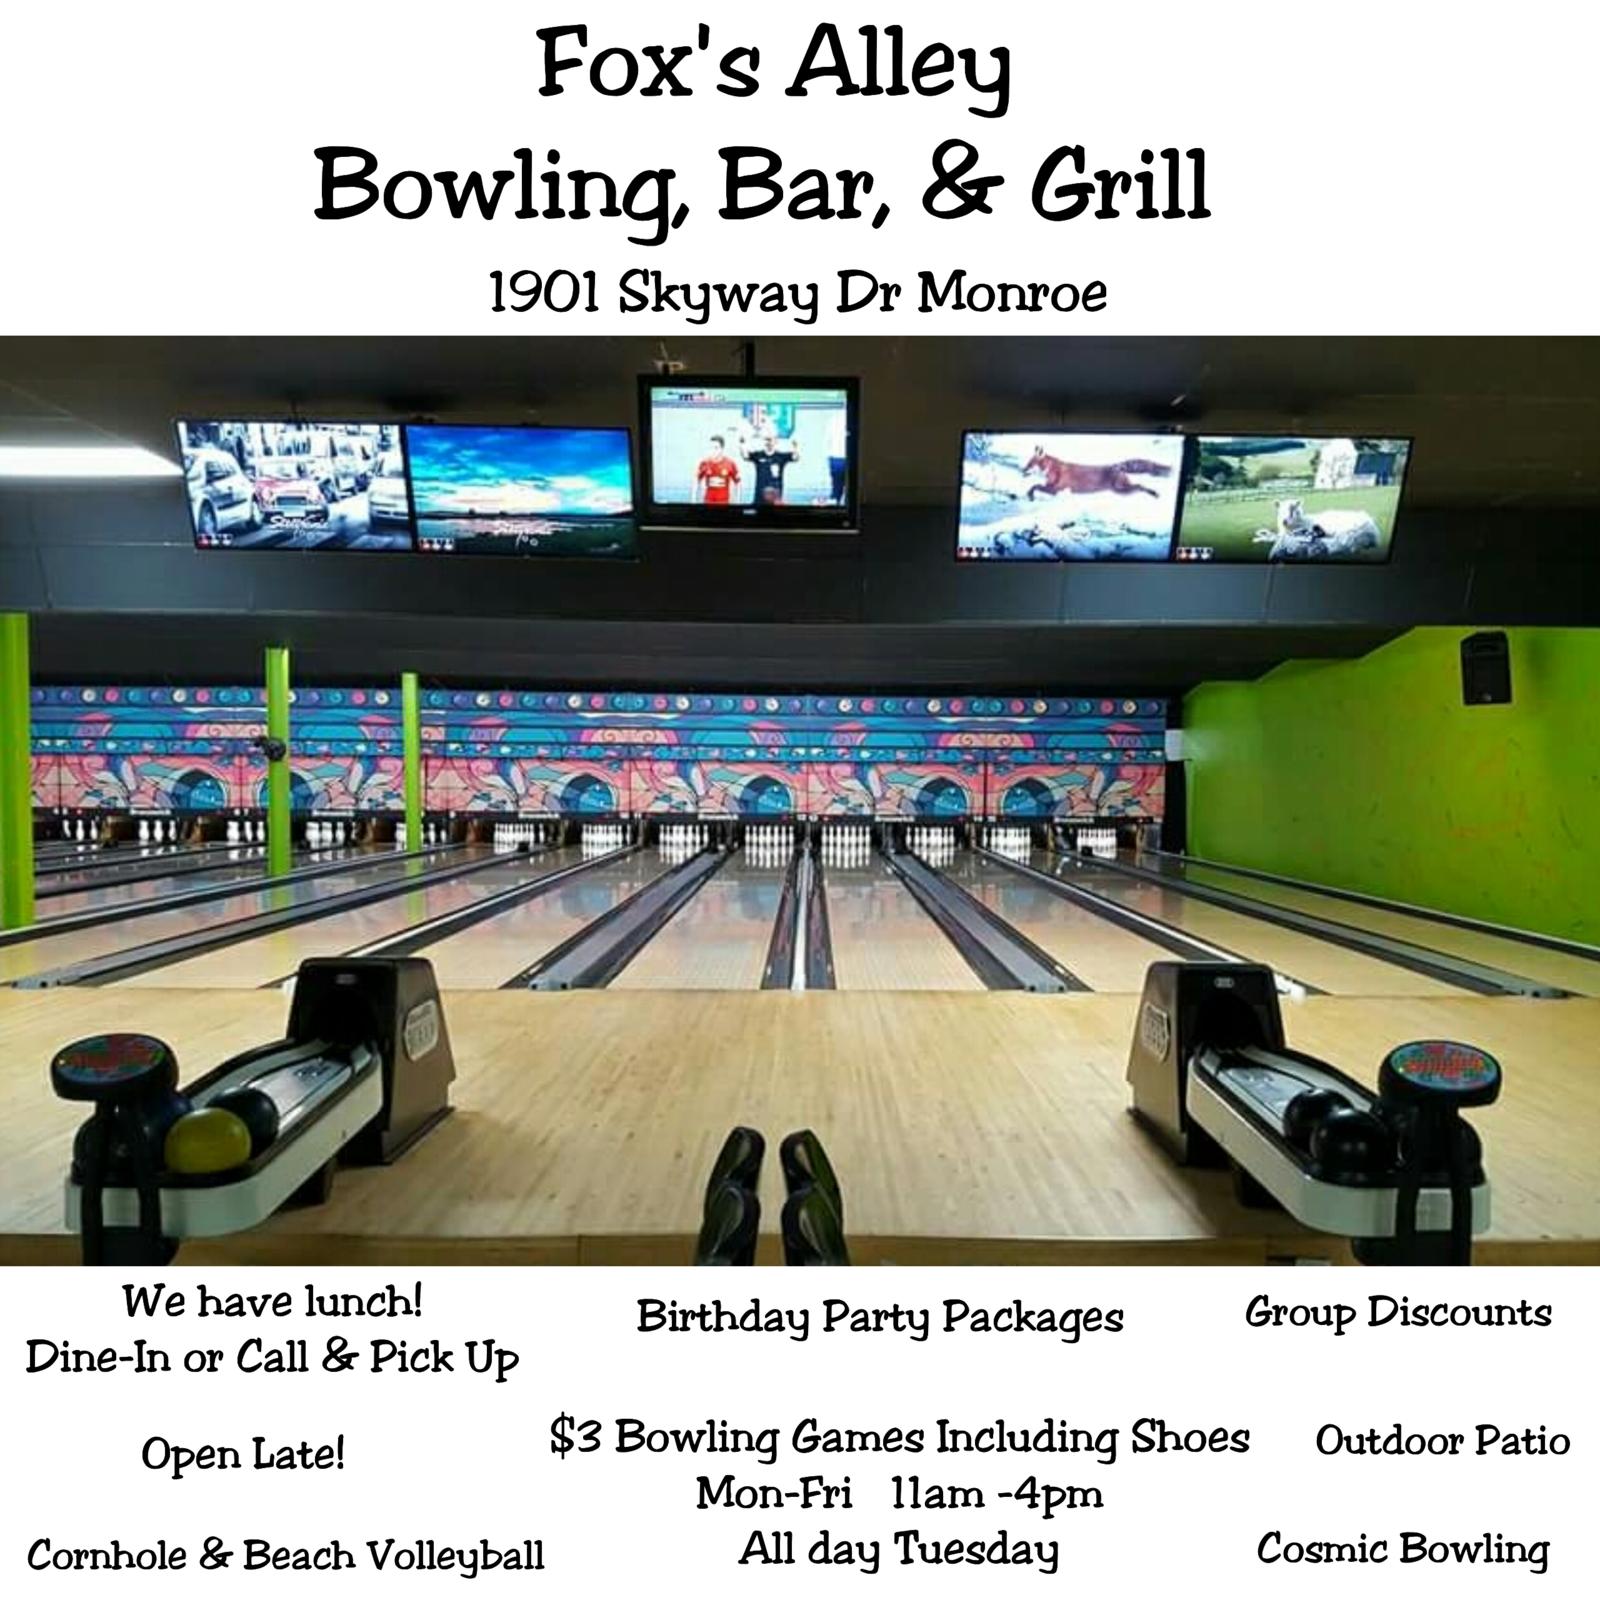 Fox's Alley Bowling In Monroe, NC